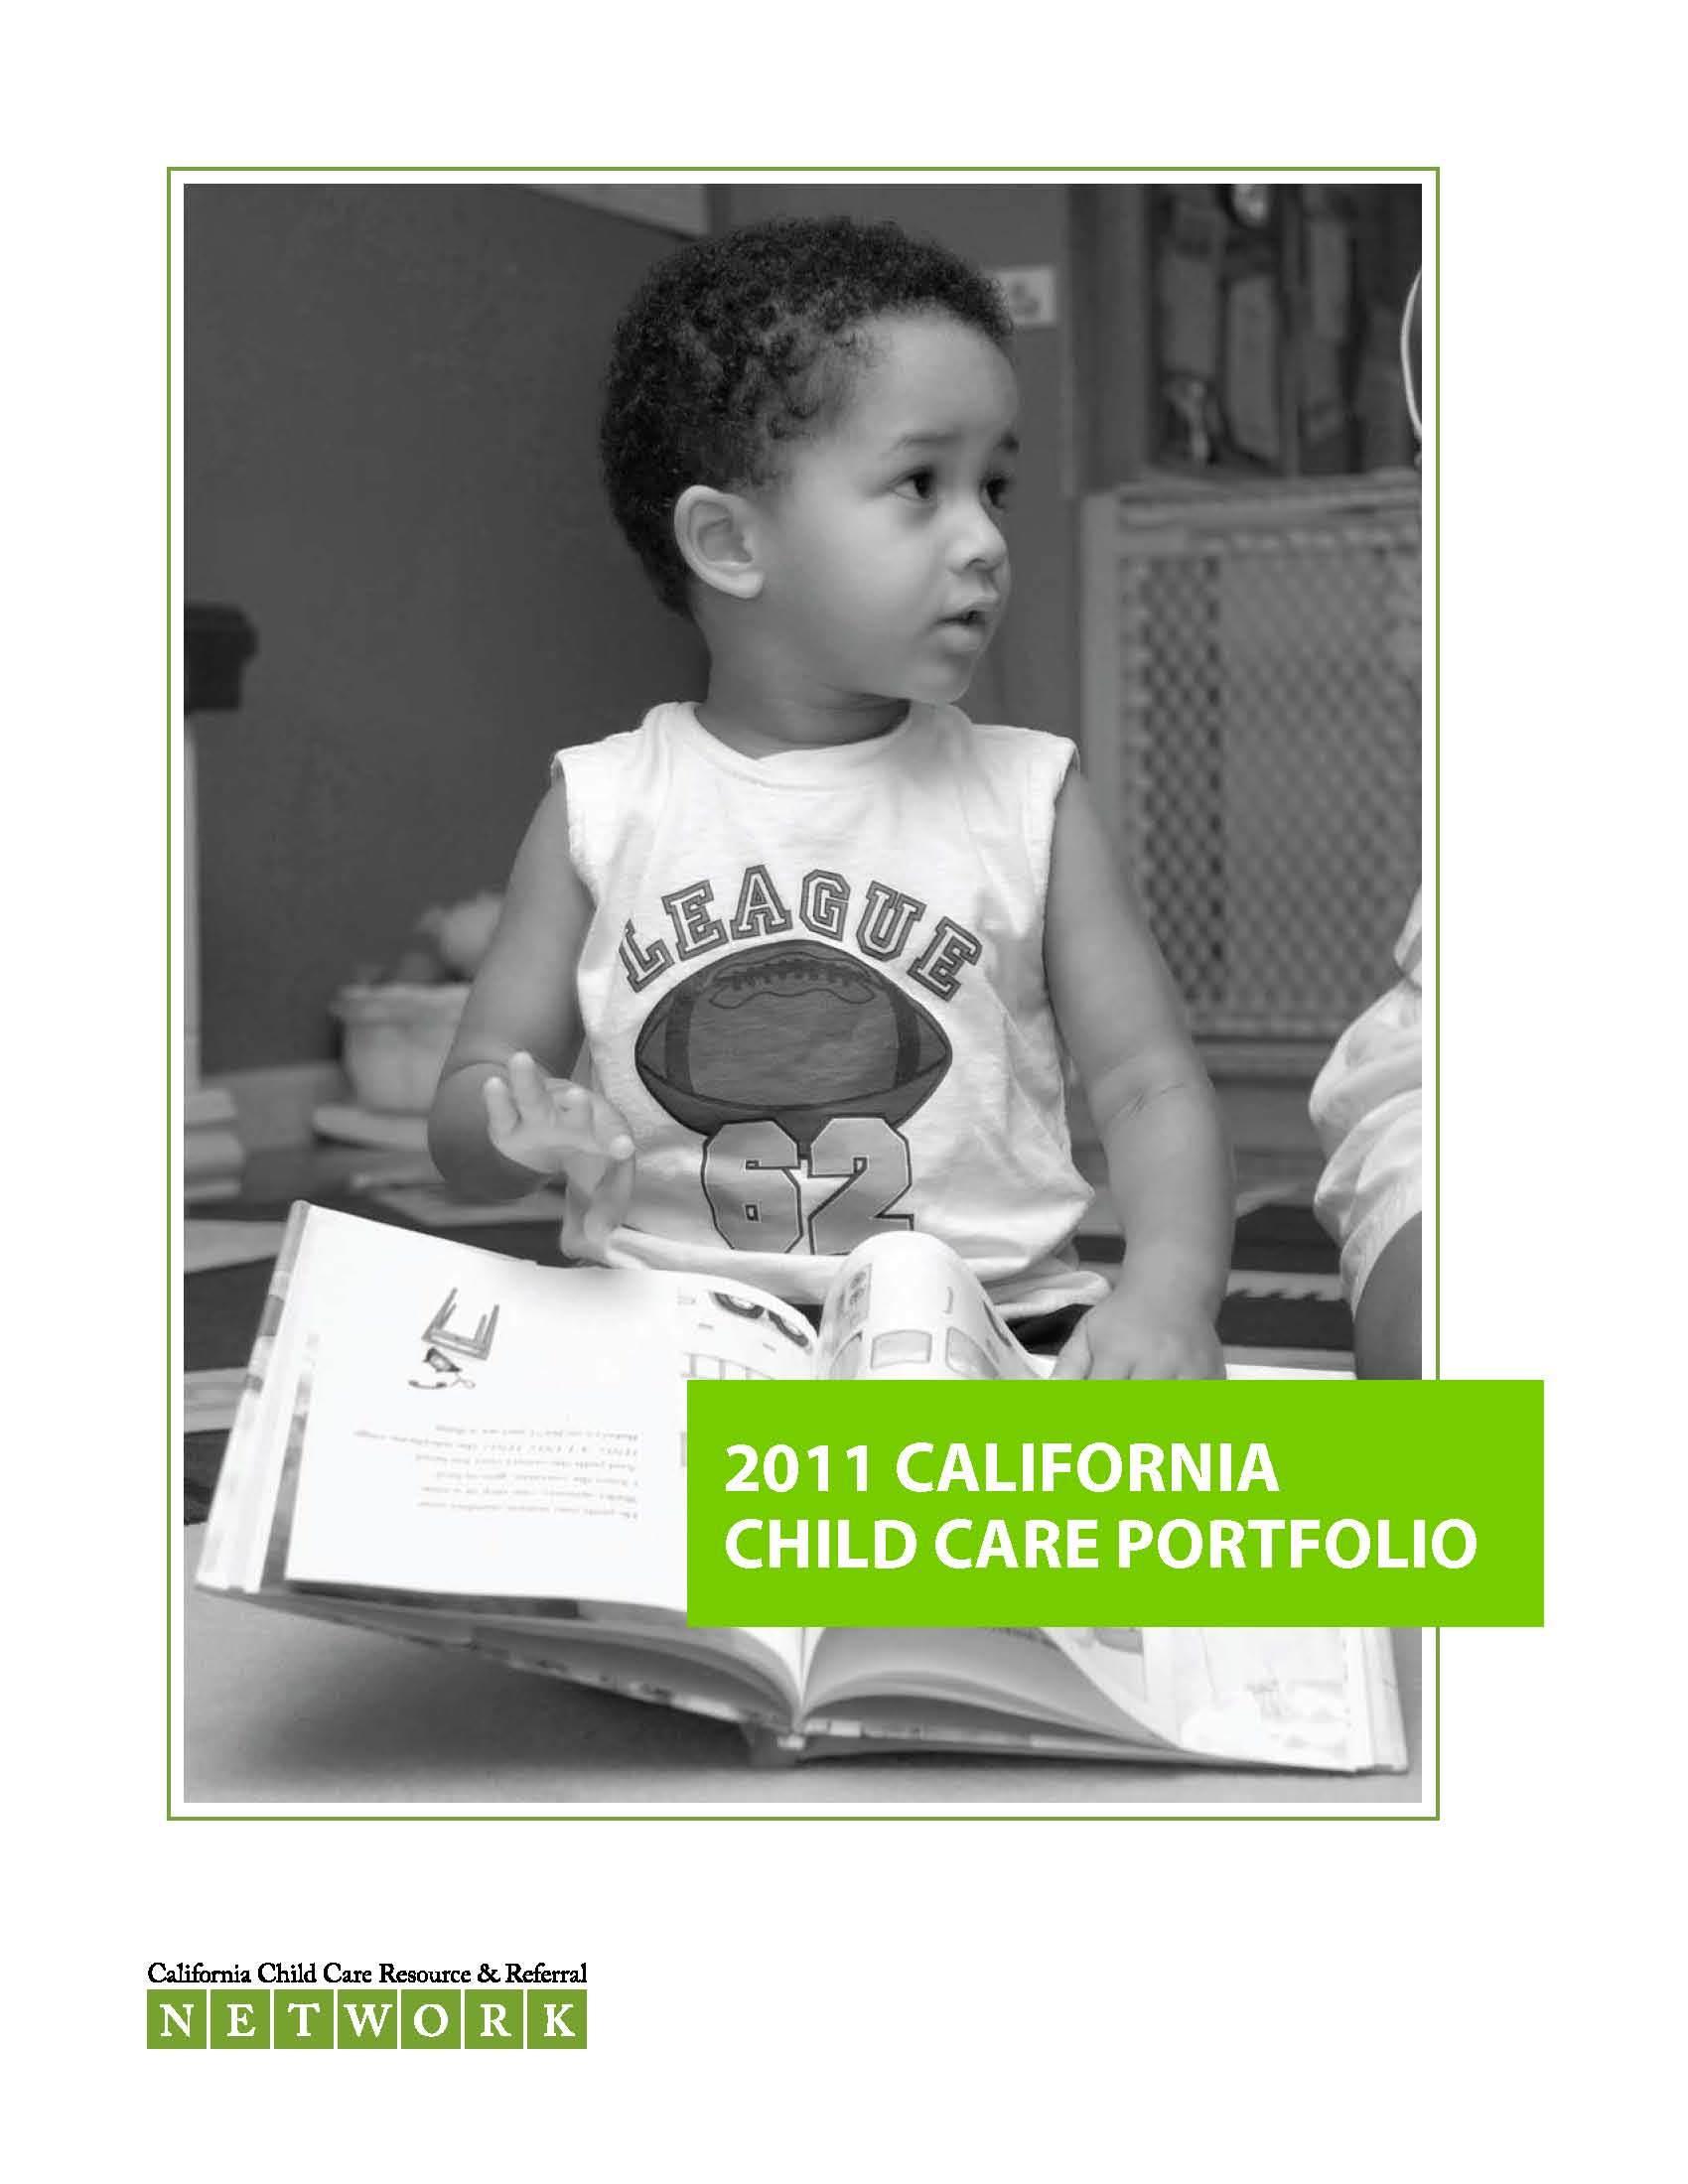 2011 portfolio cover page